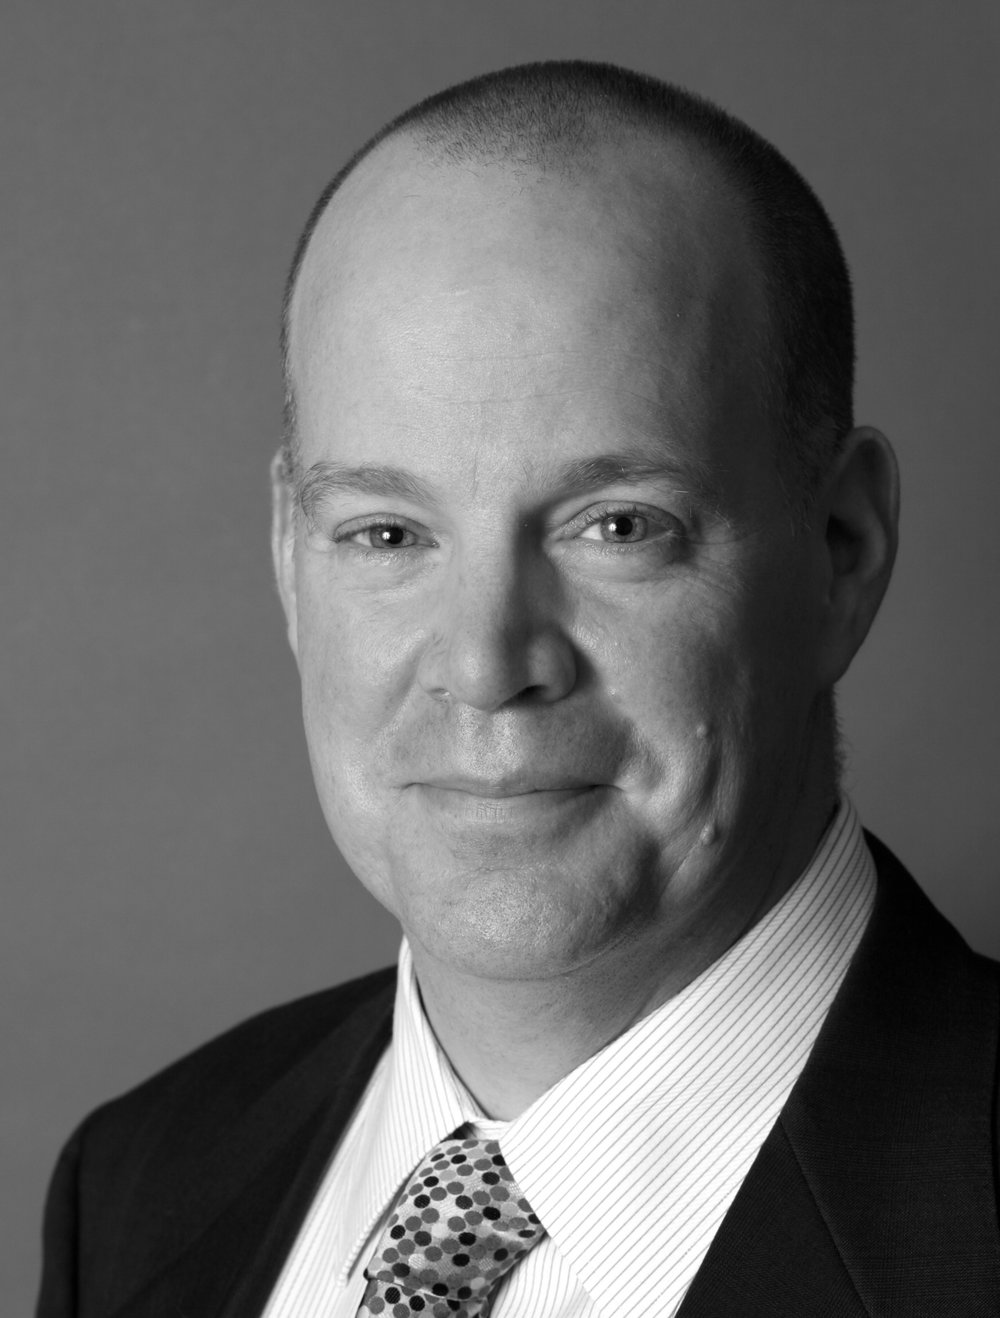 Frank T. Troise - Expertise: Asset & Wealth ManagementLinkedIn Profile